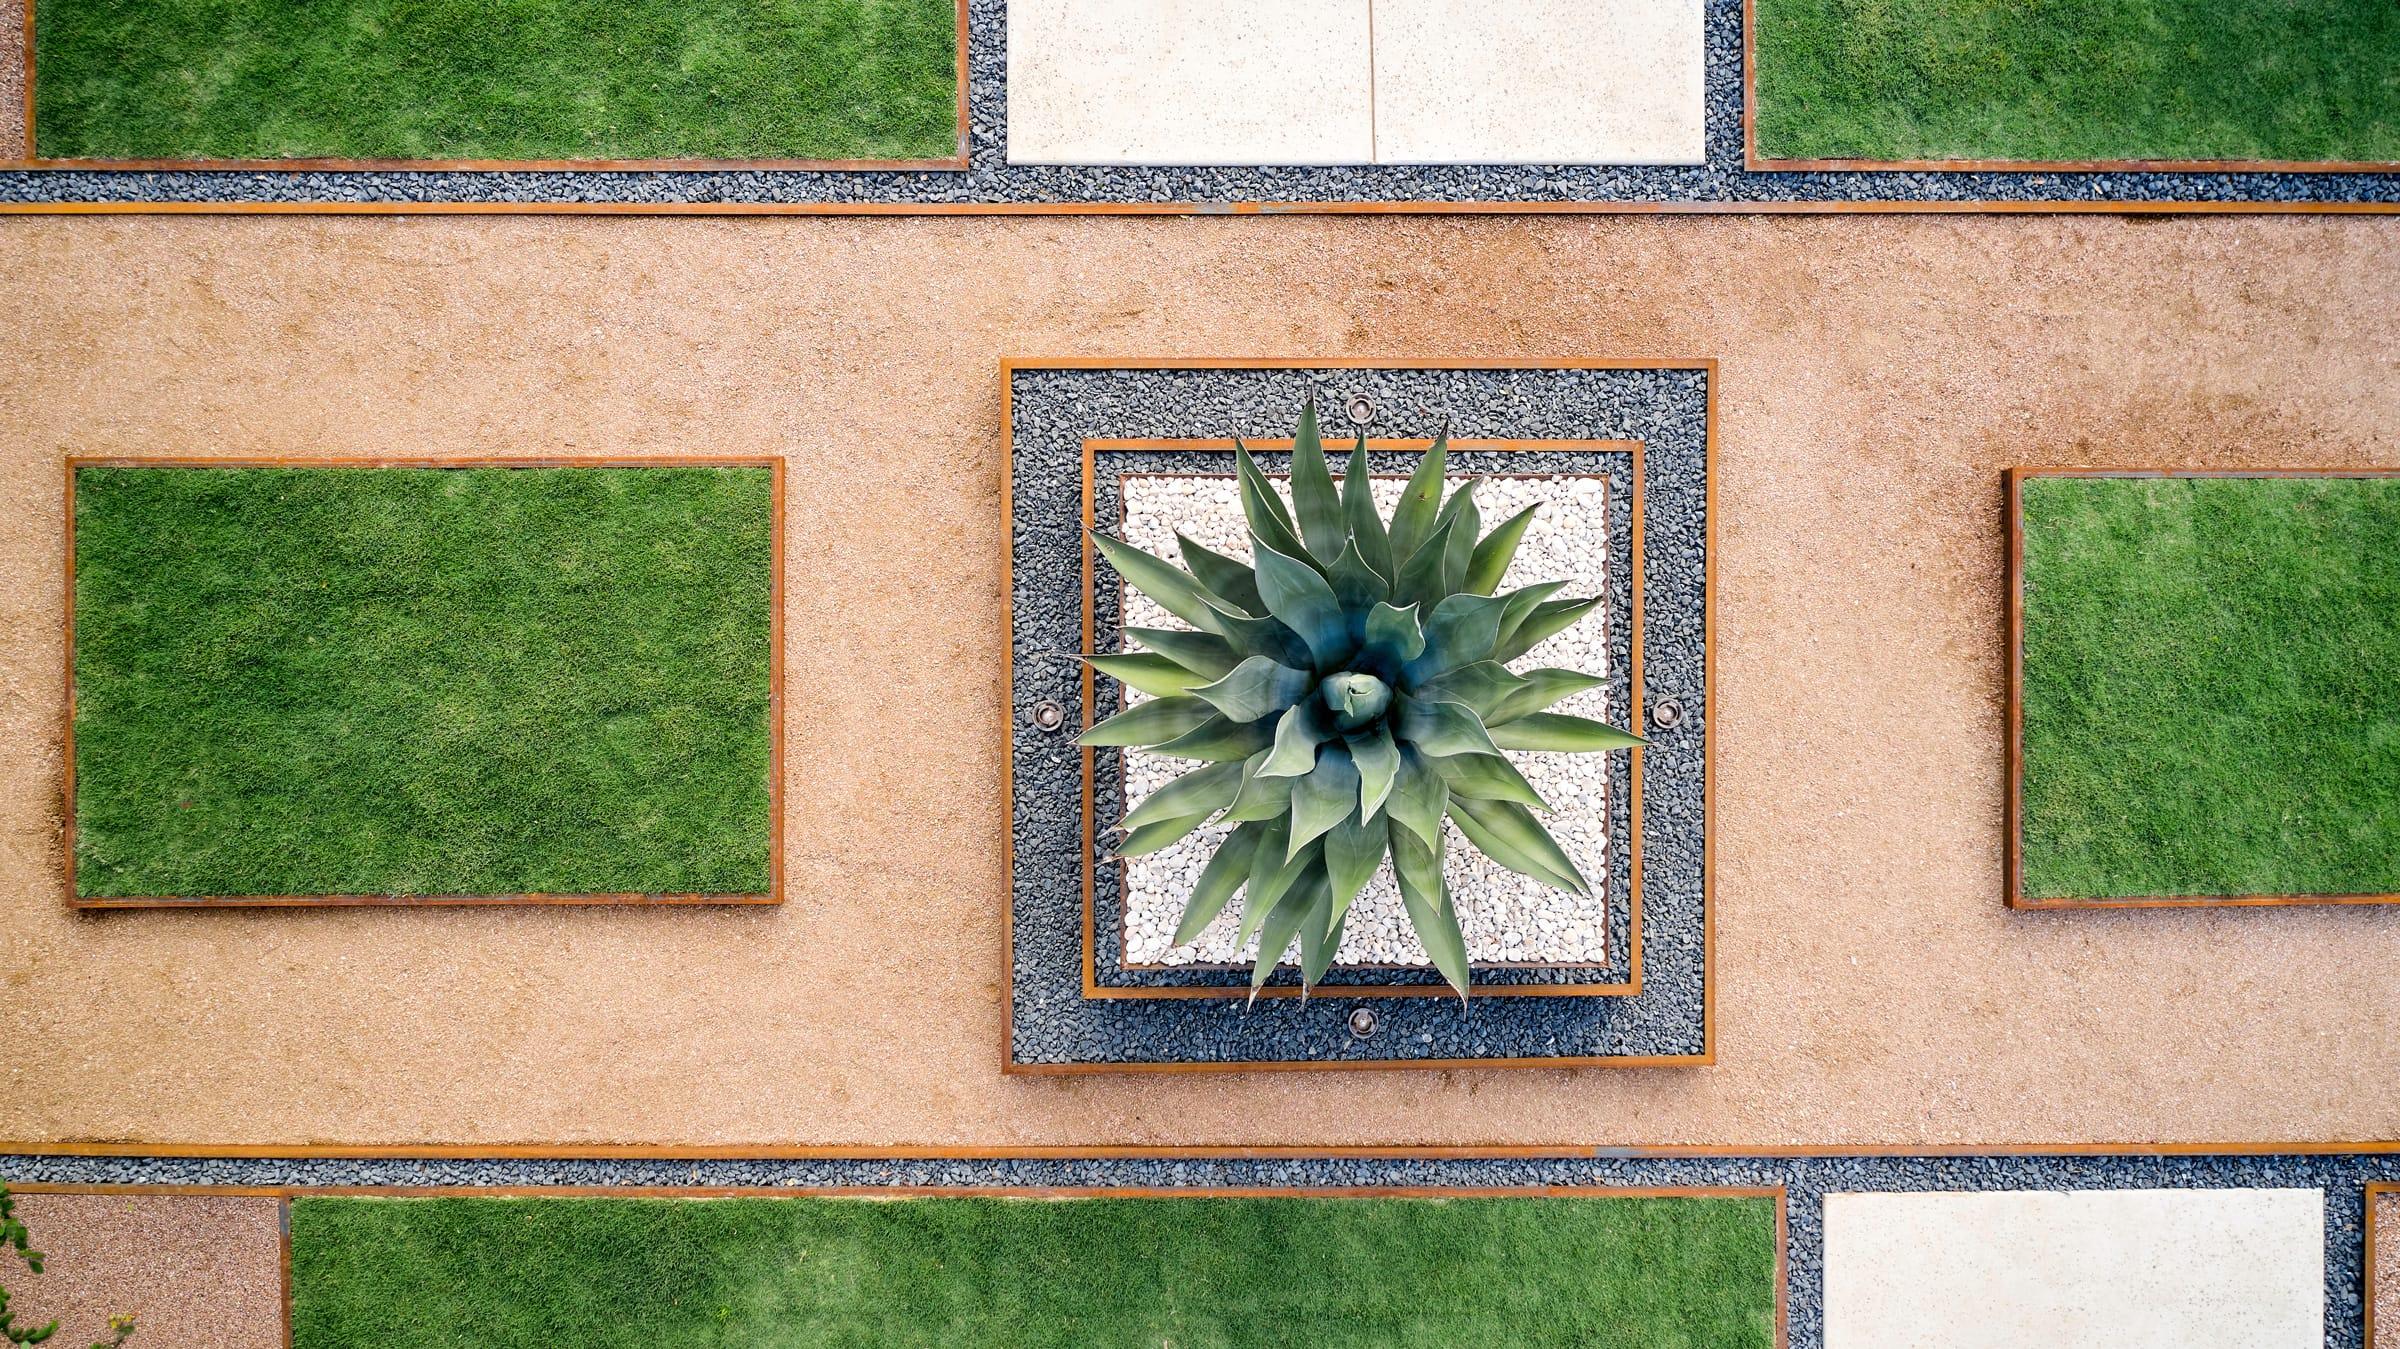 Doehne Oaks sustainable landscape design in New Braunfels, TX by LUSH GreenScape Design